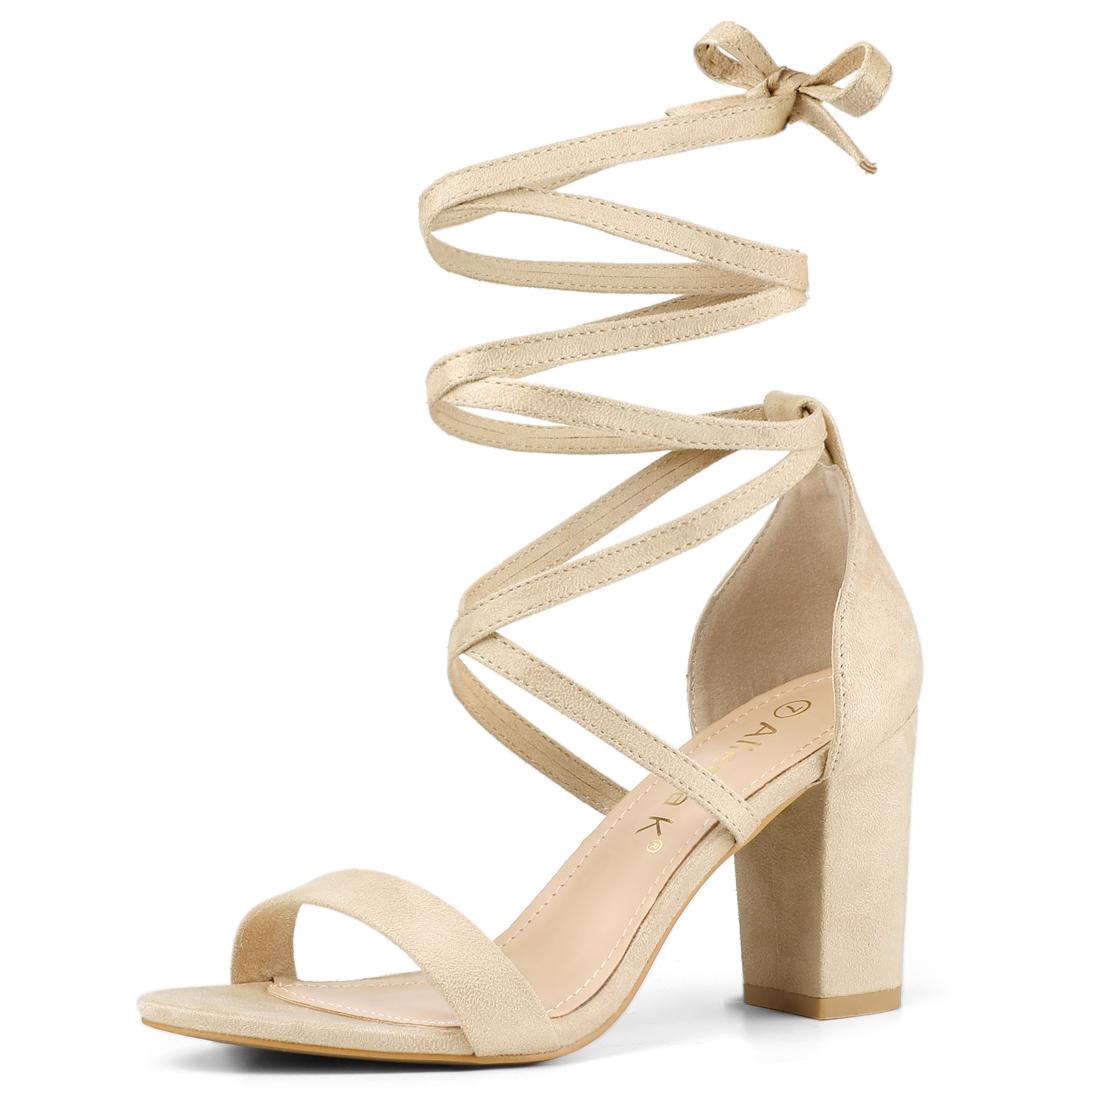 Women's One Strap Block Heel Lace Up Sandals Beige US 7